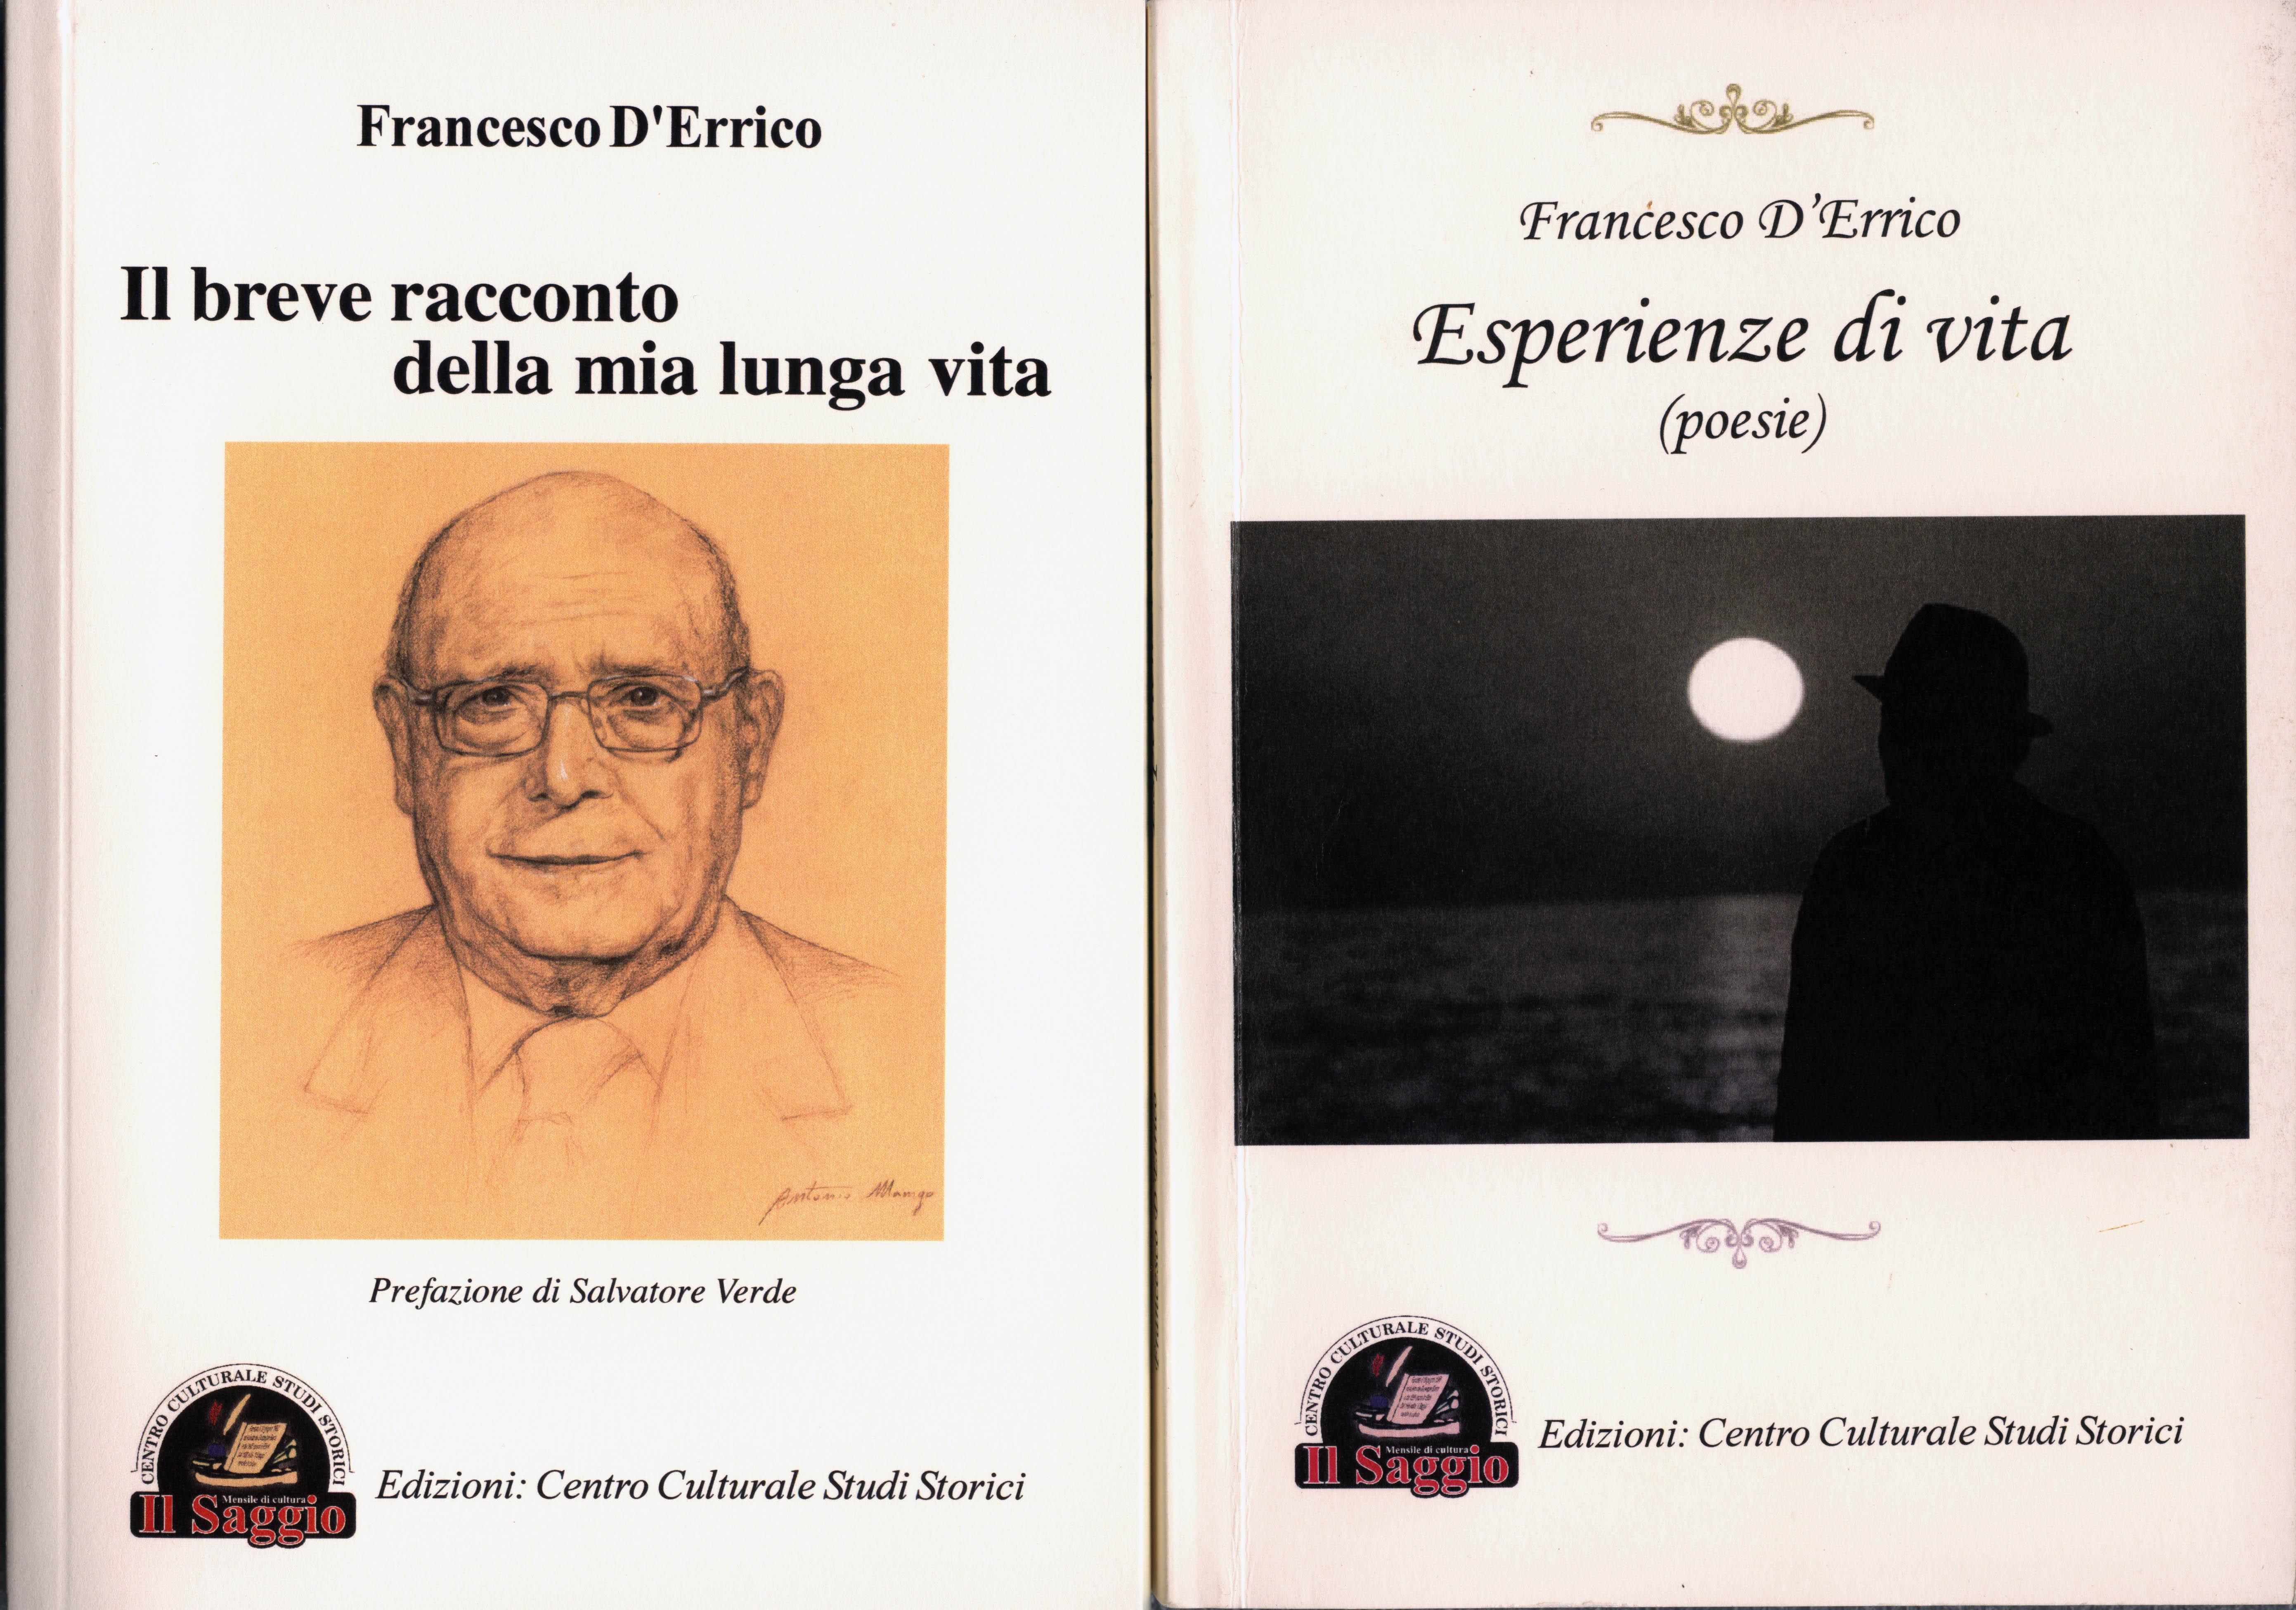 Copertine dei due libri di Francesco D'Errico